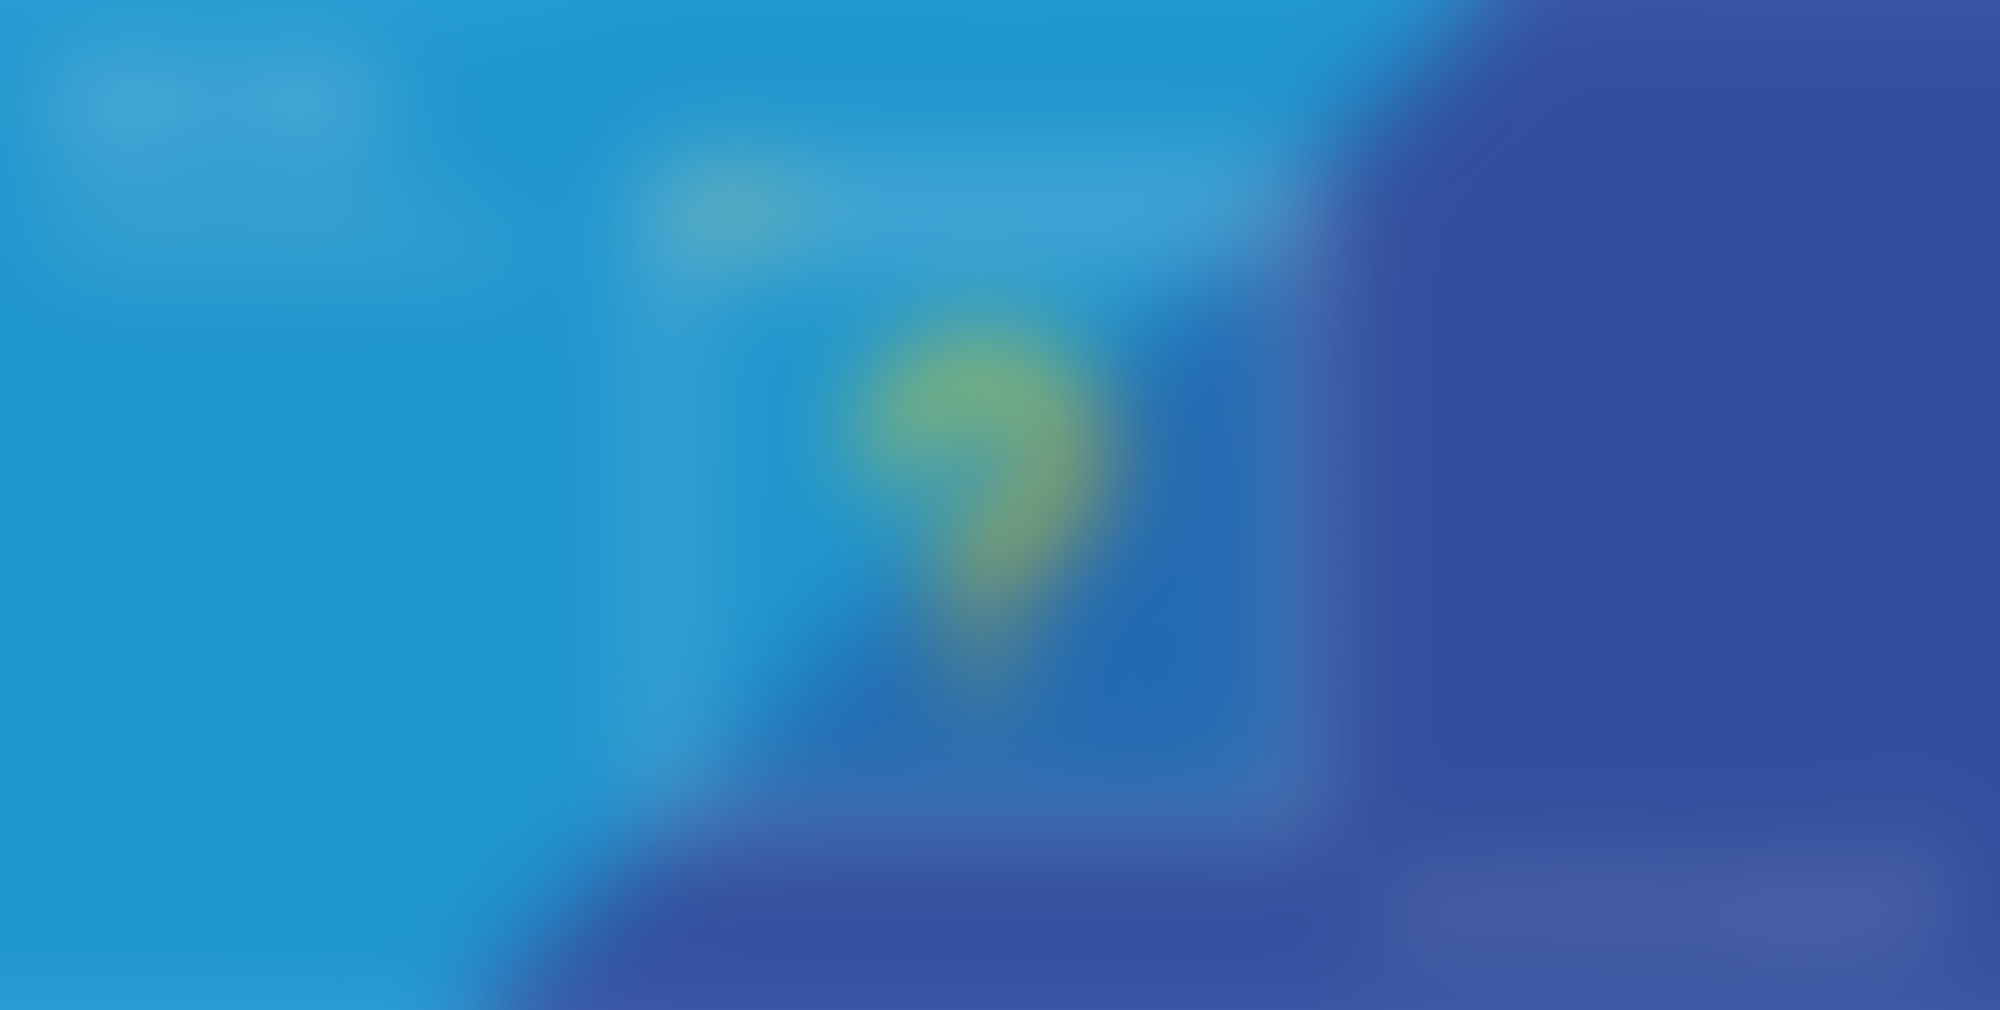 Paul Mann YCC Crib Crits JWT Promo Poster Designed by Dean Robert Smith autocompressfitresizeixlibphp 1 1 0max h2000max w3 D2000q80s7bde5b0577a0b926cd6c505d50c27c78